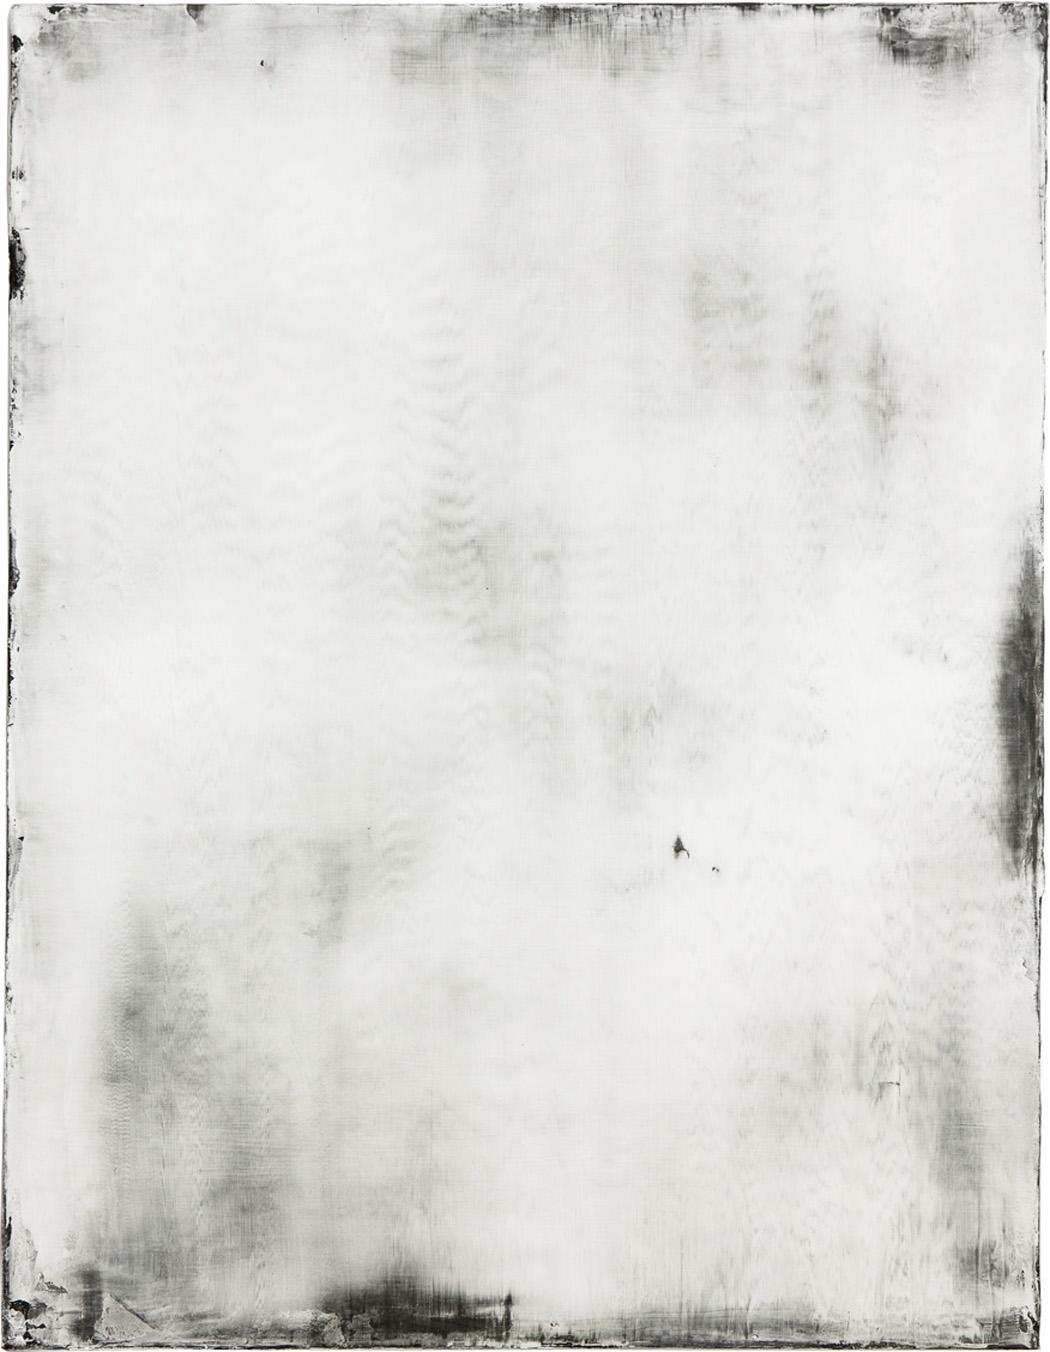 Hideaki Yamanobe_Aulanko - Daylight No. 2, 2011, Acryl-Mischtechnik auf Leinwand, 130 x 100 cm